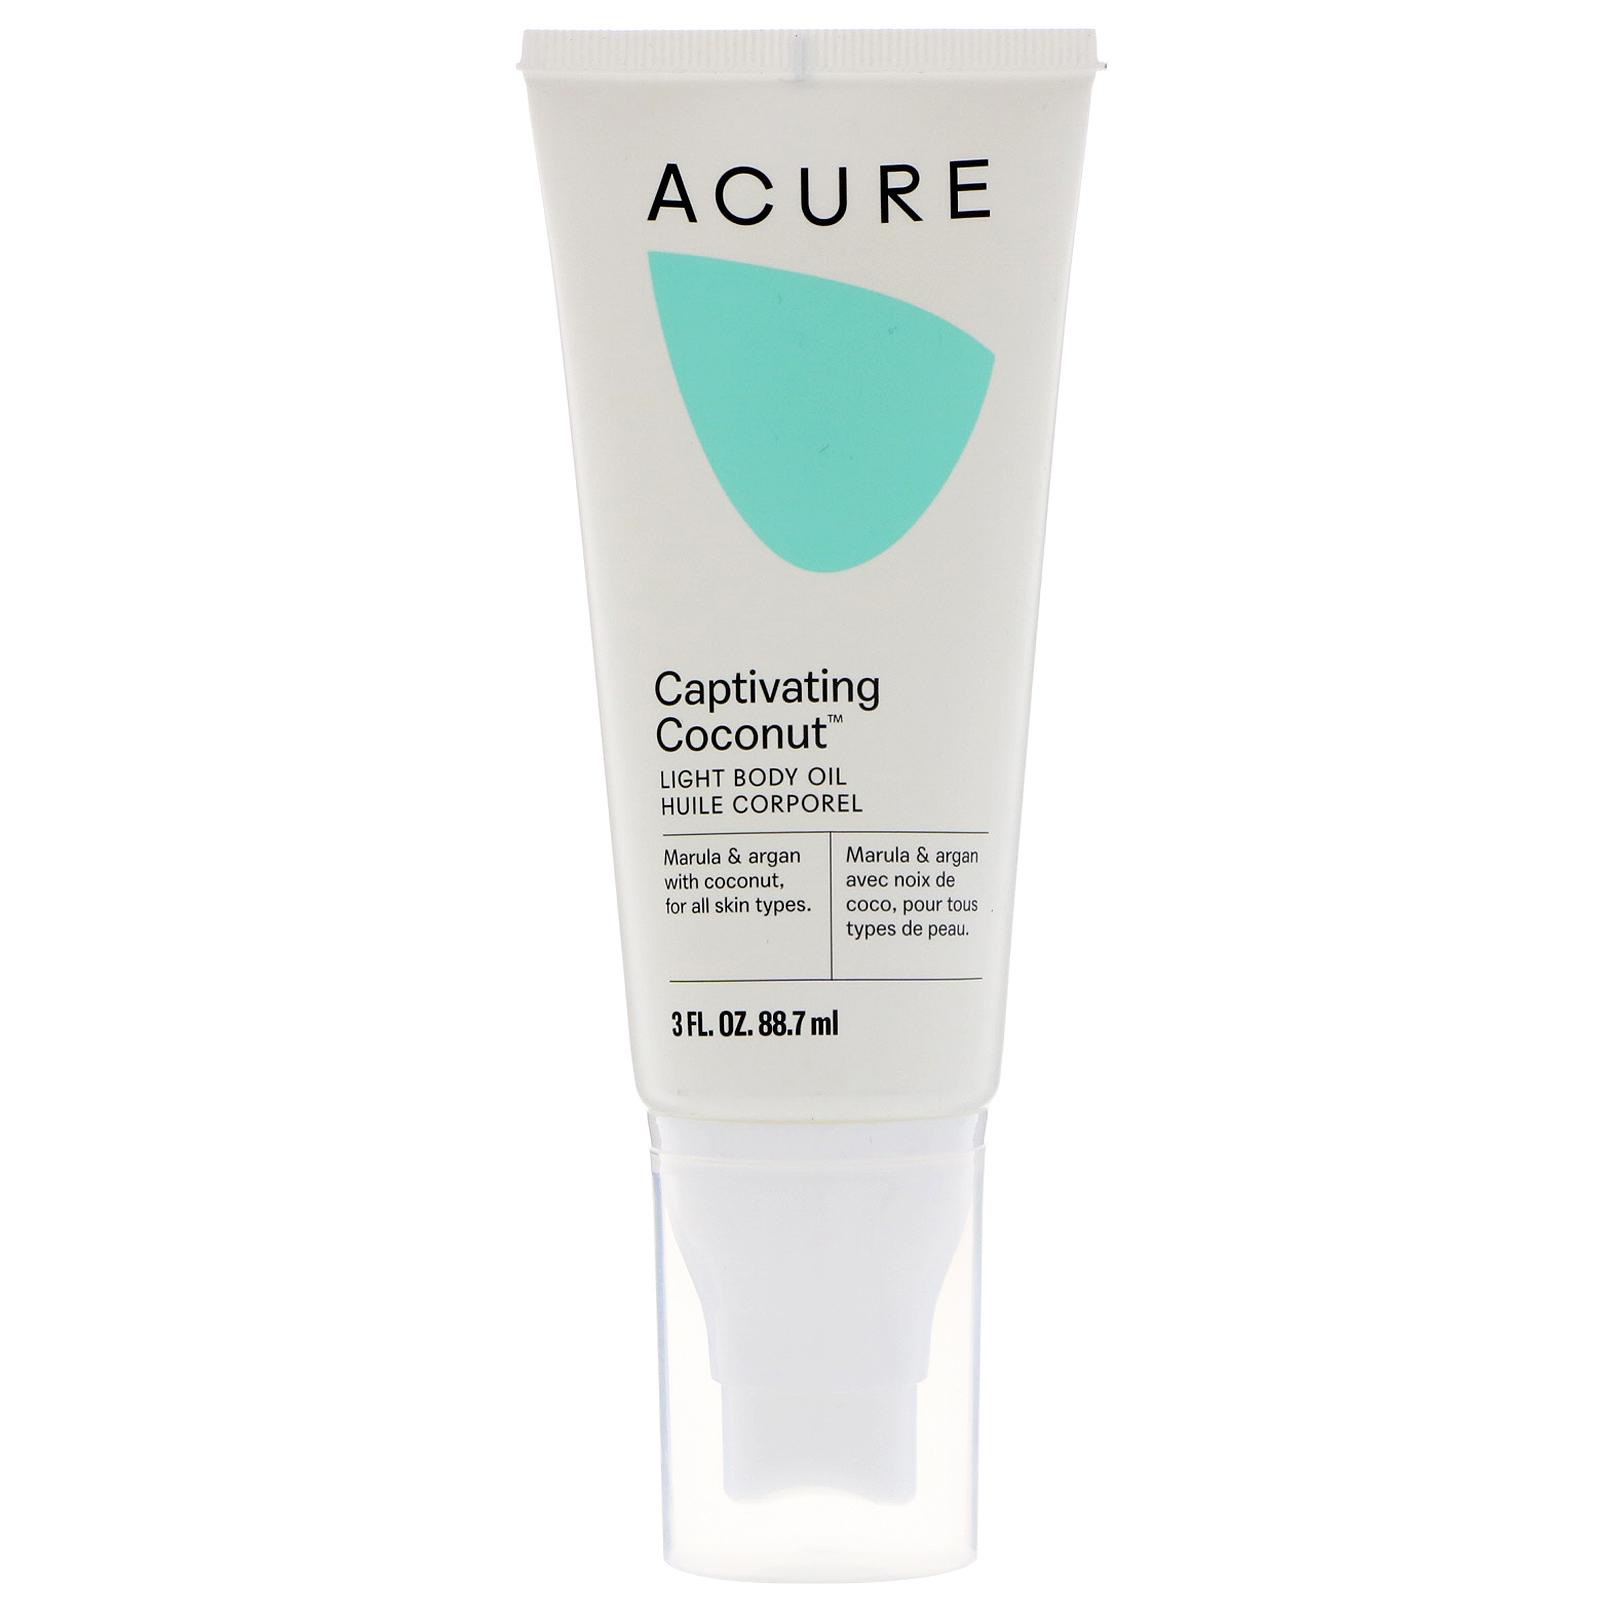 Acure, Light Body Oil, Captivating Coconut, 3 Fl Oz (88.7